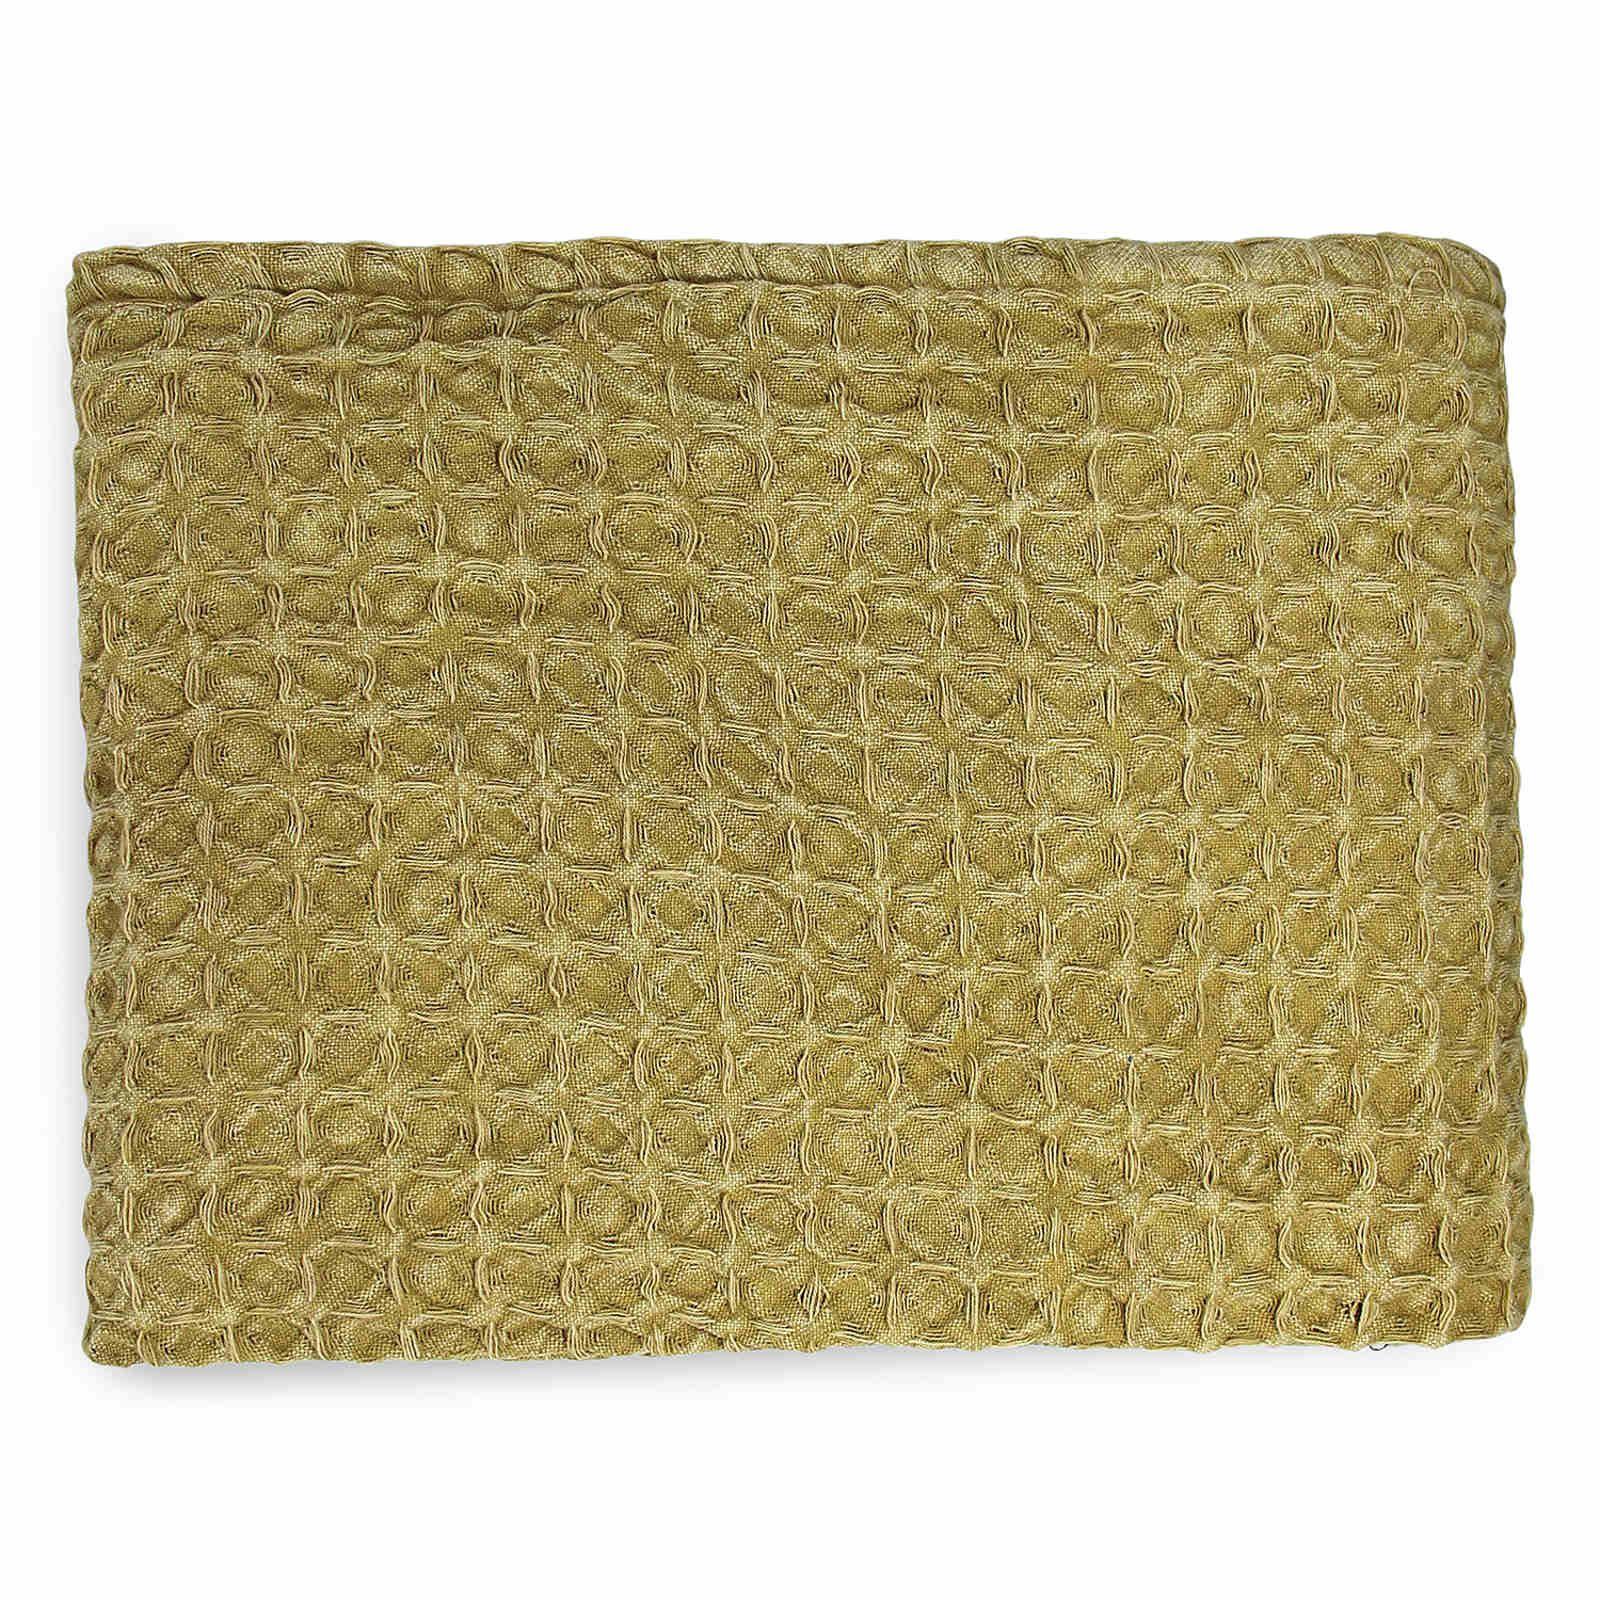 Oregon-Stonewash-Waffle-Throw-Modern-Distressed-Sofa-Bed-Blankets-100-Cotton thumbnail 17